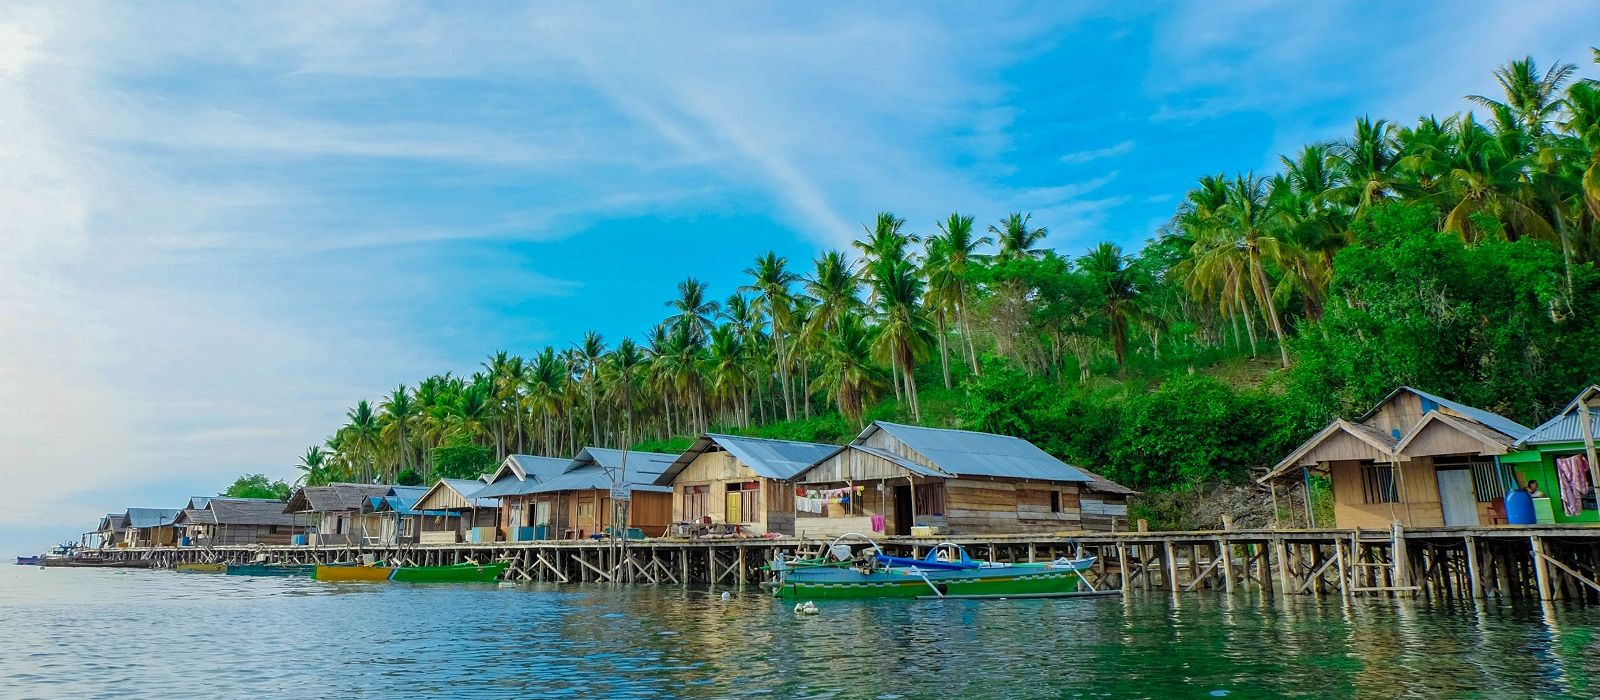 Destination Ampana Indonesia